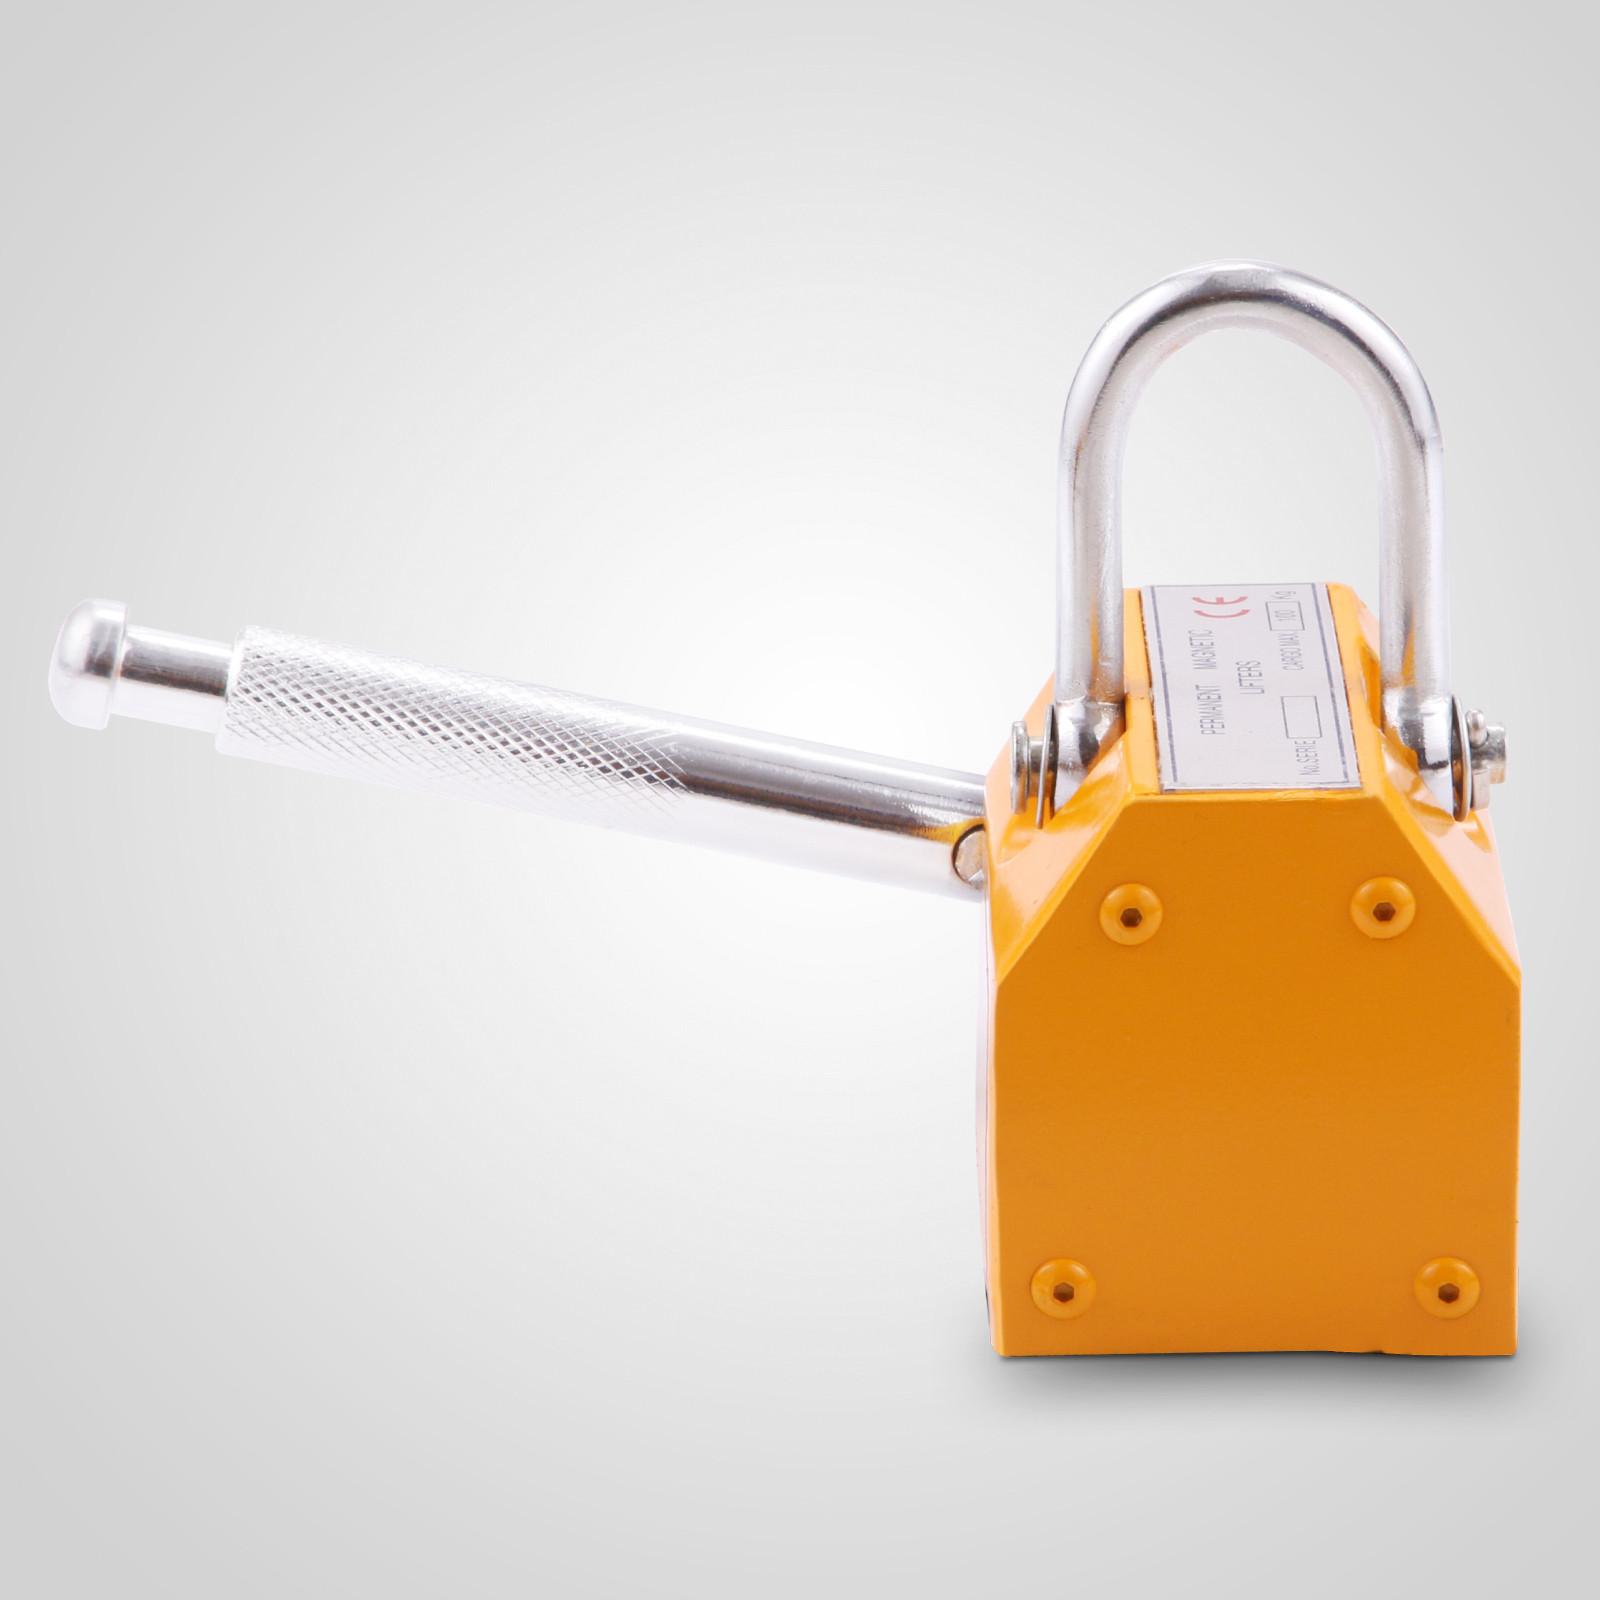 100-300-600-1000KG-Steel-Magnetic-Lifter-Heavy-Duty-Crane-Hoist-Lifting-Magnet miniature 21